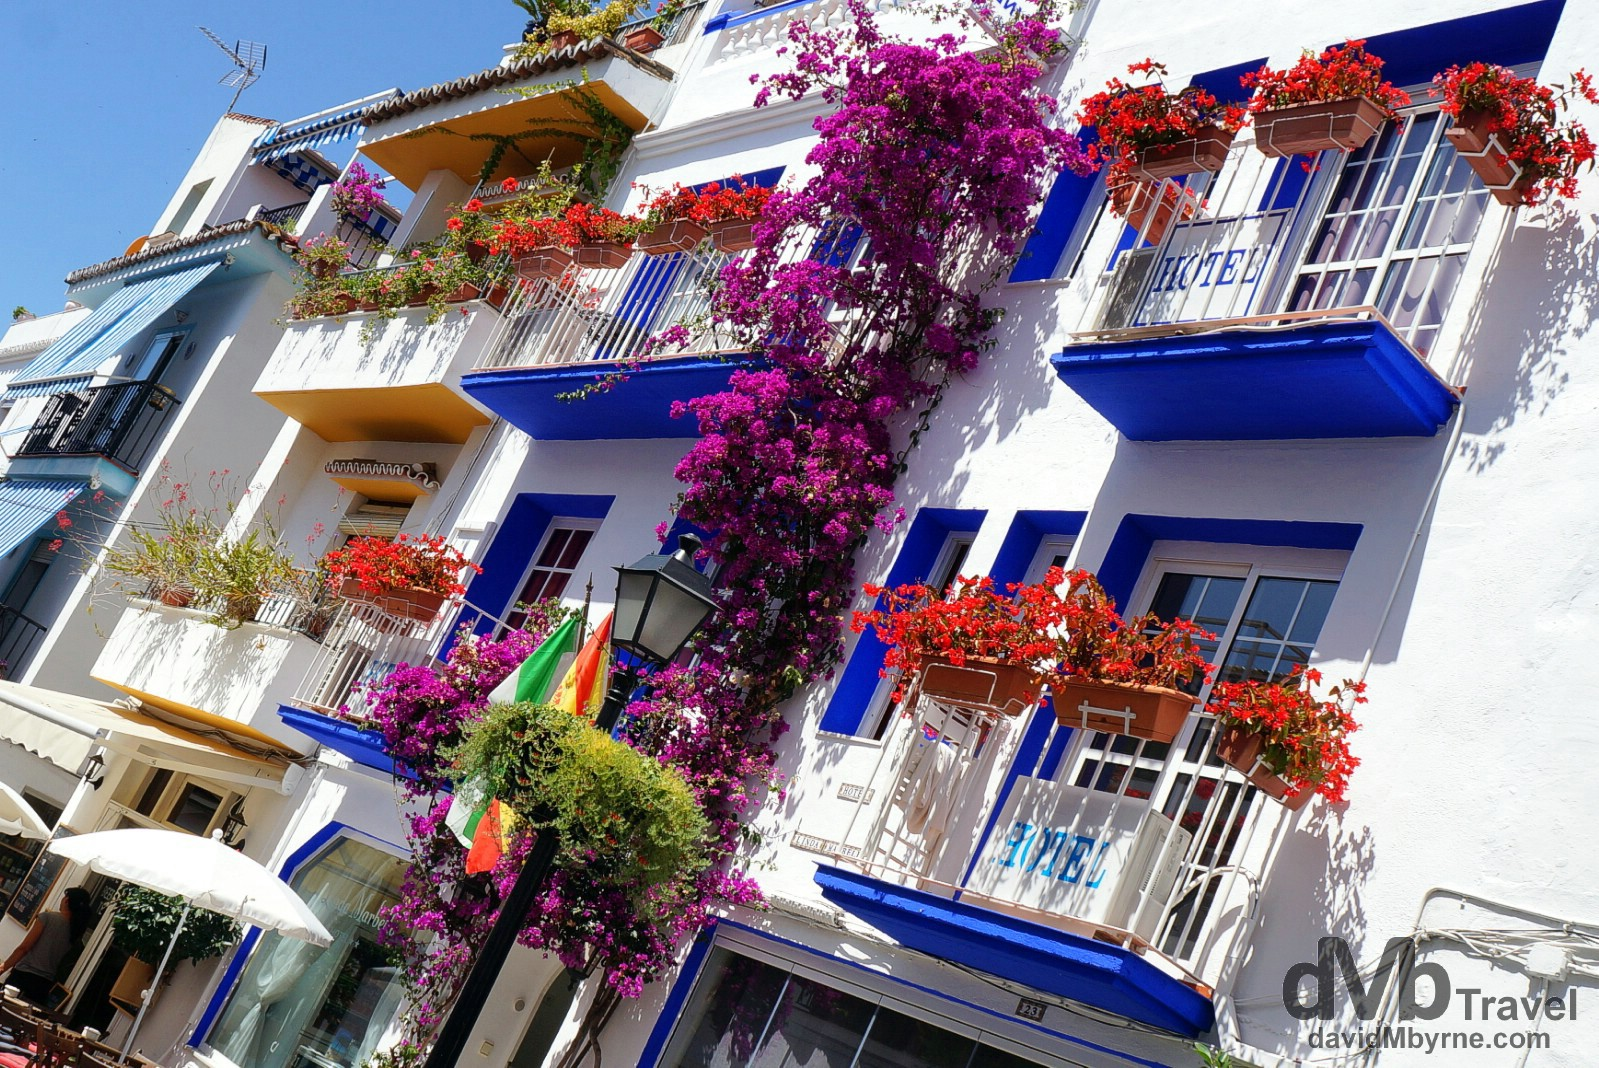 Calle Ancha, Marbella, Andalusia, Spain. June 7th, 2014.